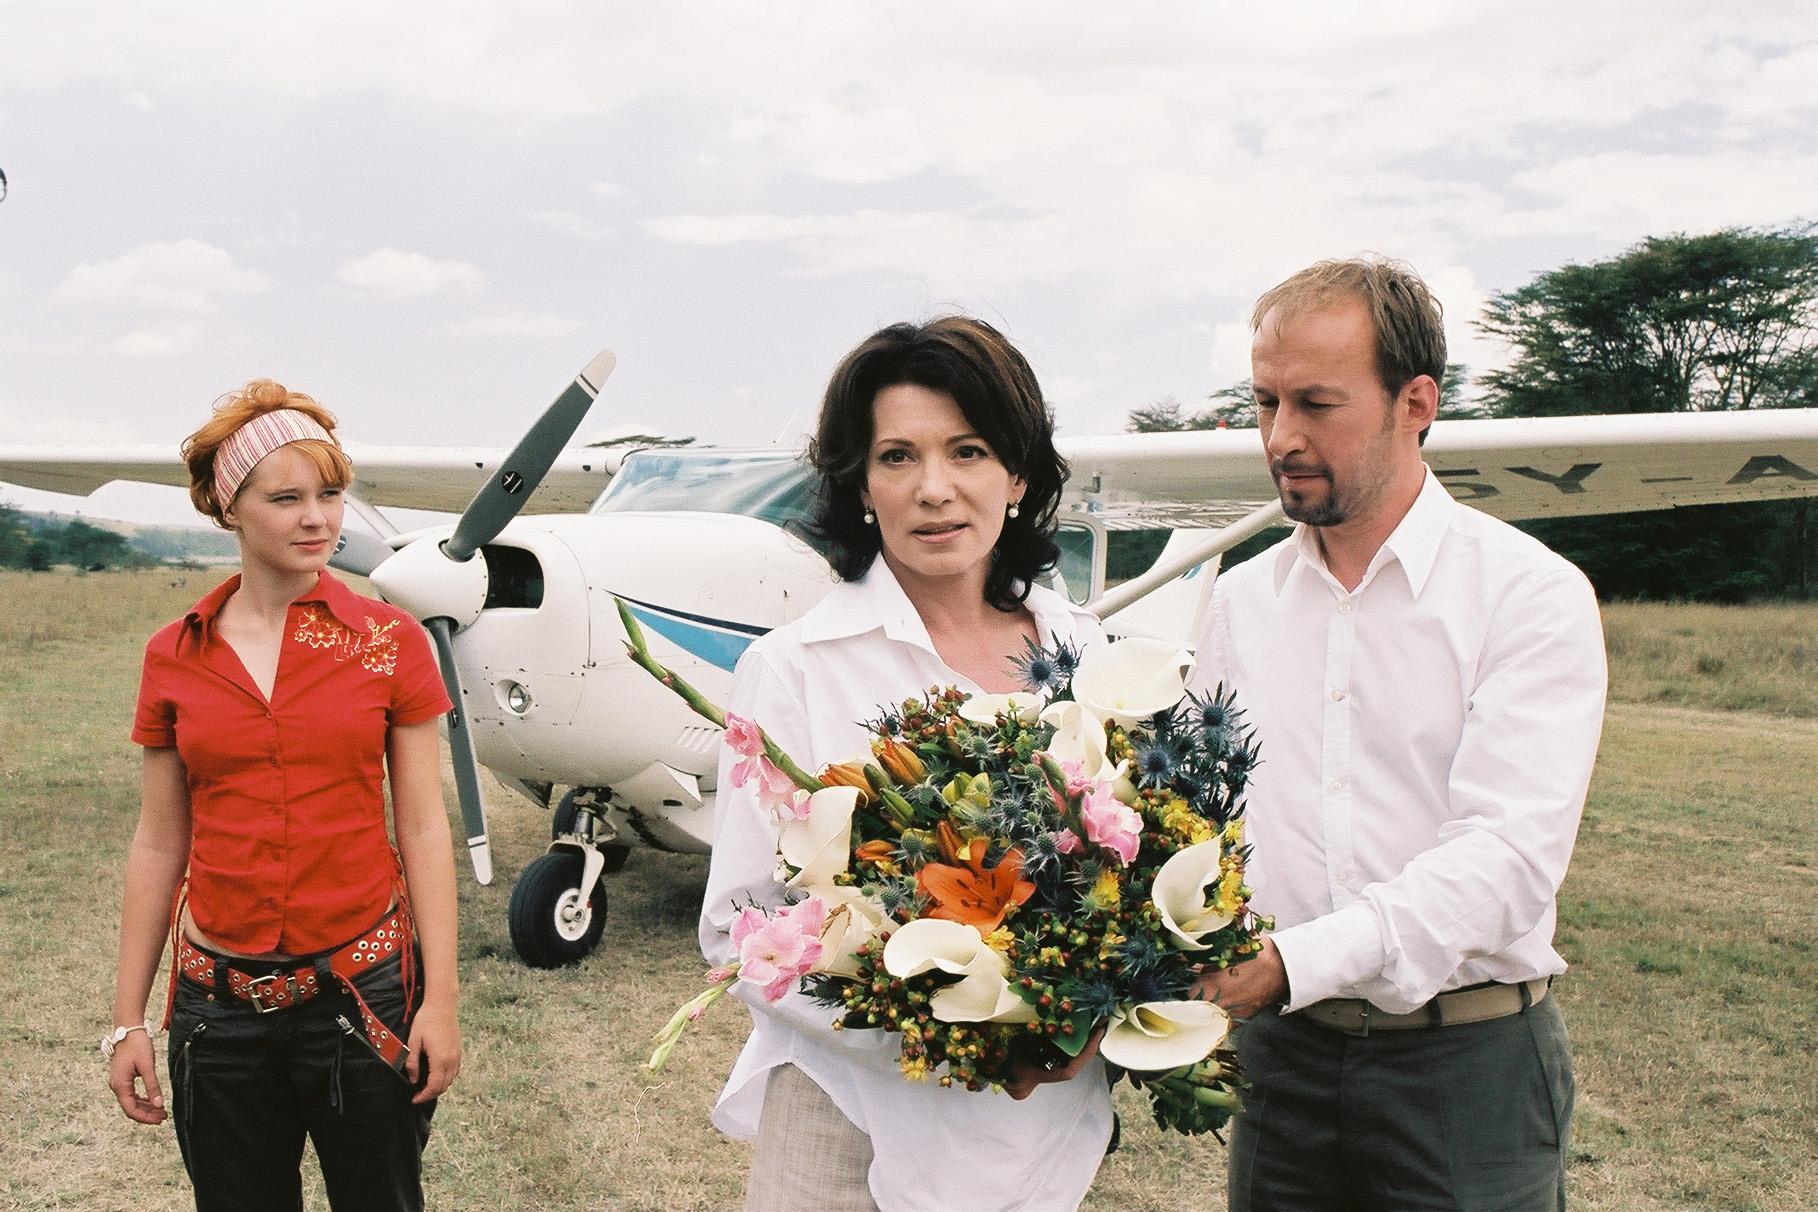 © Moovie / Stefanie Kulbach - Nadja Bobyleva, Iris Berben, Ulrich Noethen